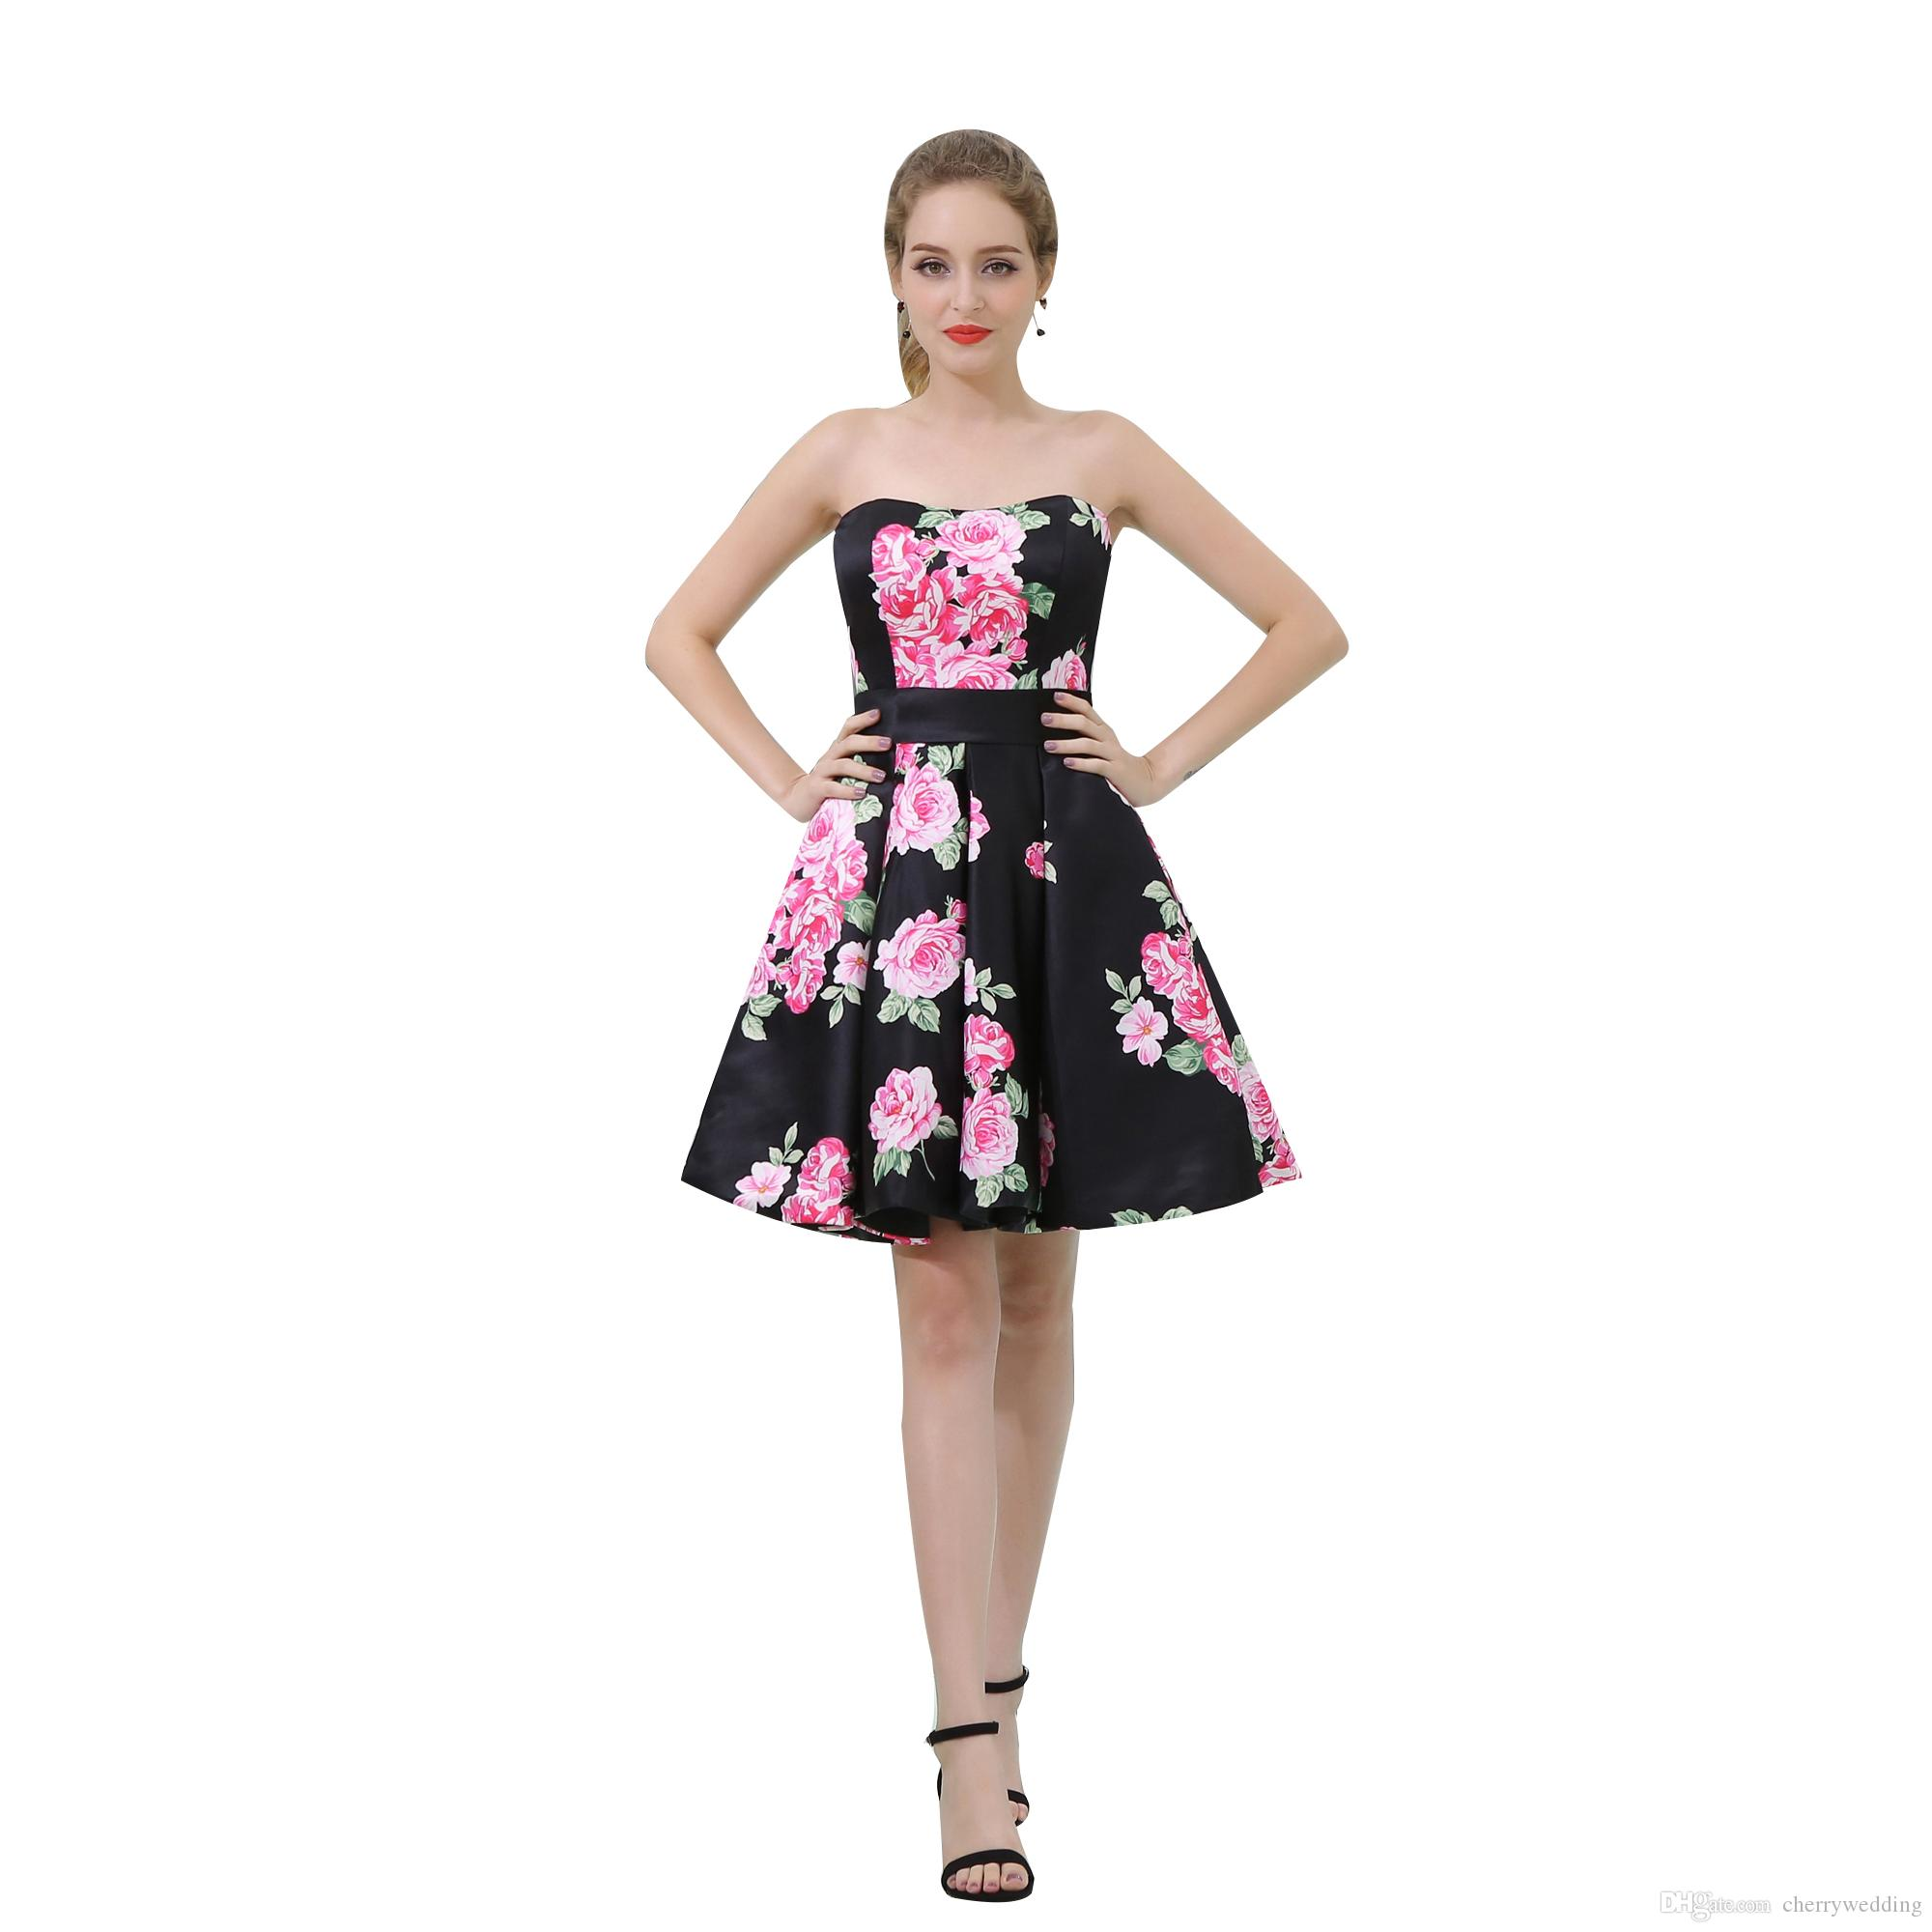 585b112b6c847 In Stock Cheap Prom Dress Print Flowers Evening Dresses Formal Gowns 2019  Robe De Bal Knee Length Print Flower Evening Dress B039 Unusual Prom Dresses  ...